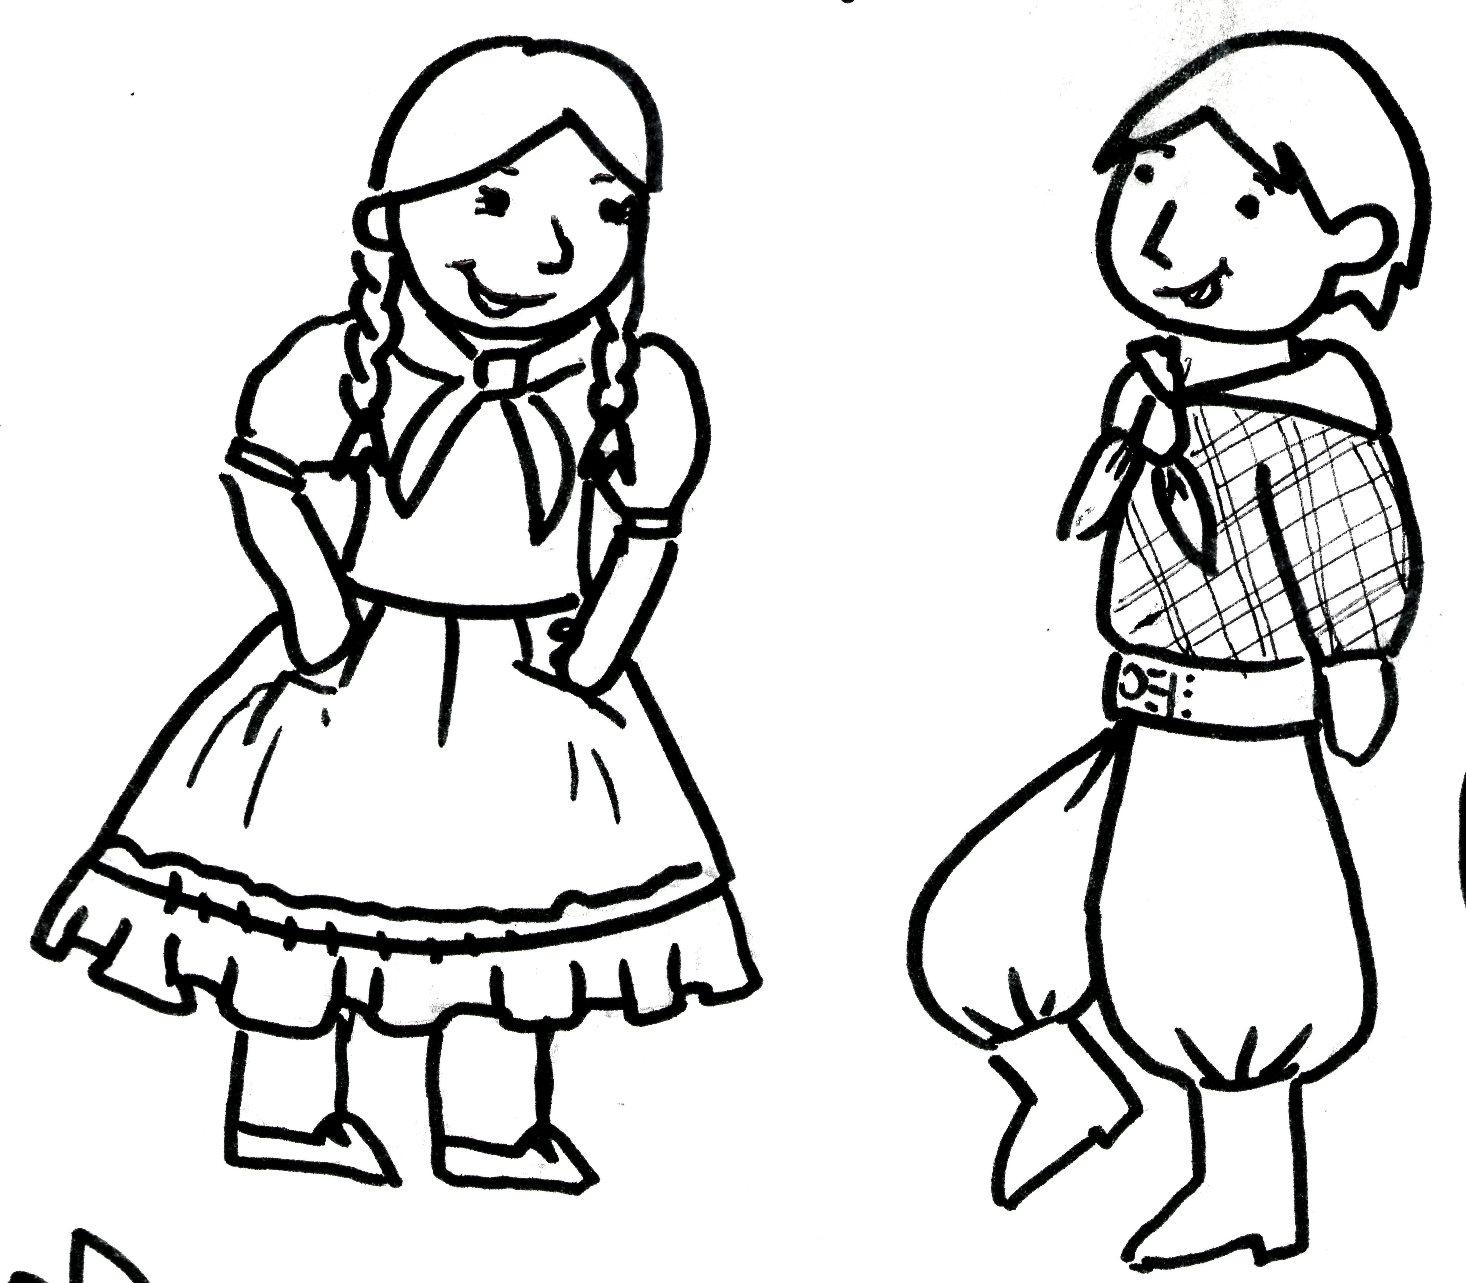 Dibujos de danza folklorica mexicana para colorear - Imagui